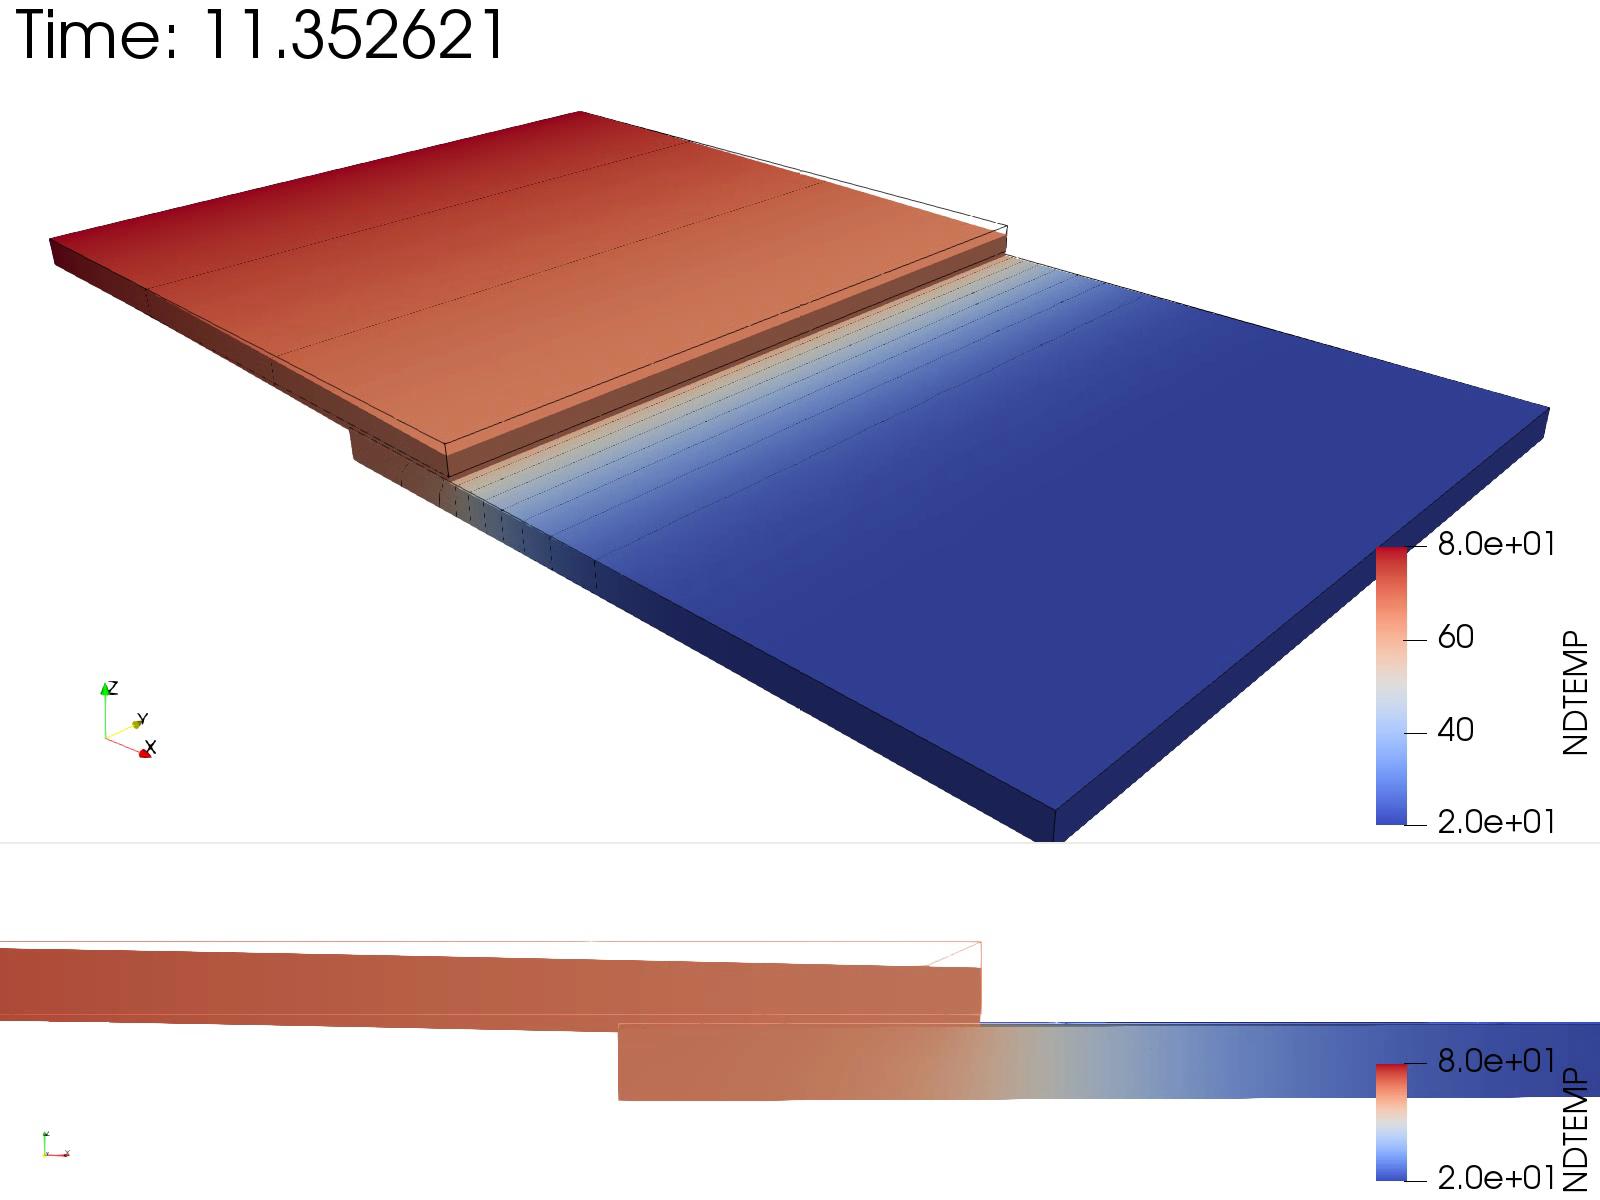 CulculiX_ペナルティ接触モデル(contact pair)_熱伝導解析